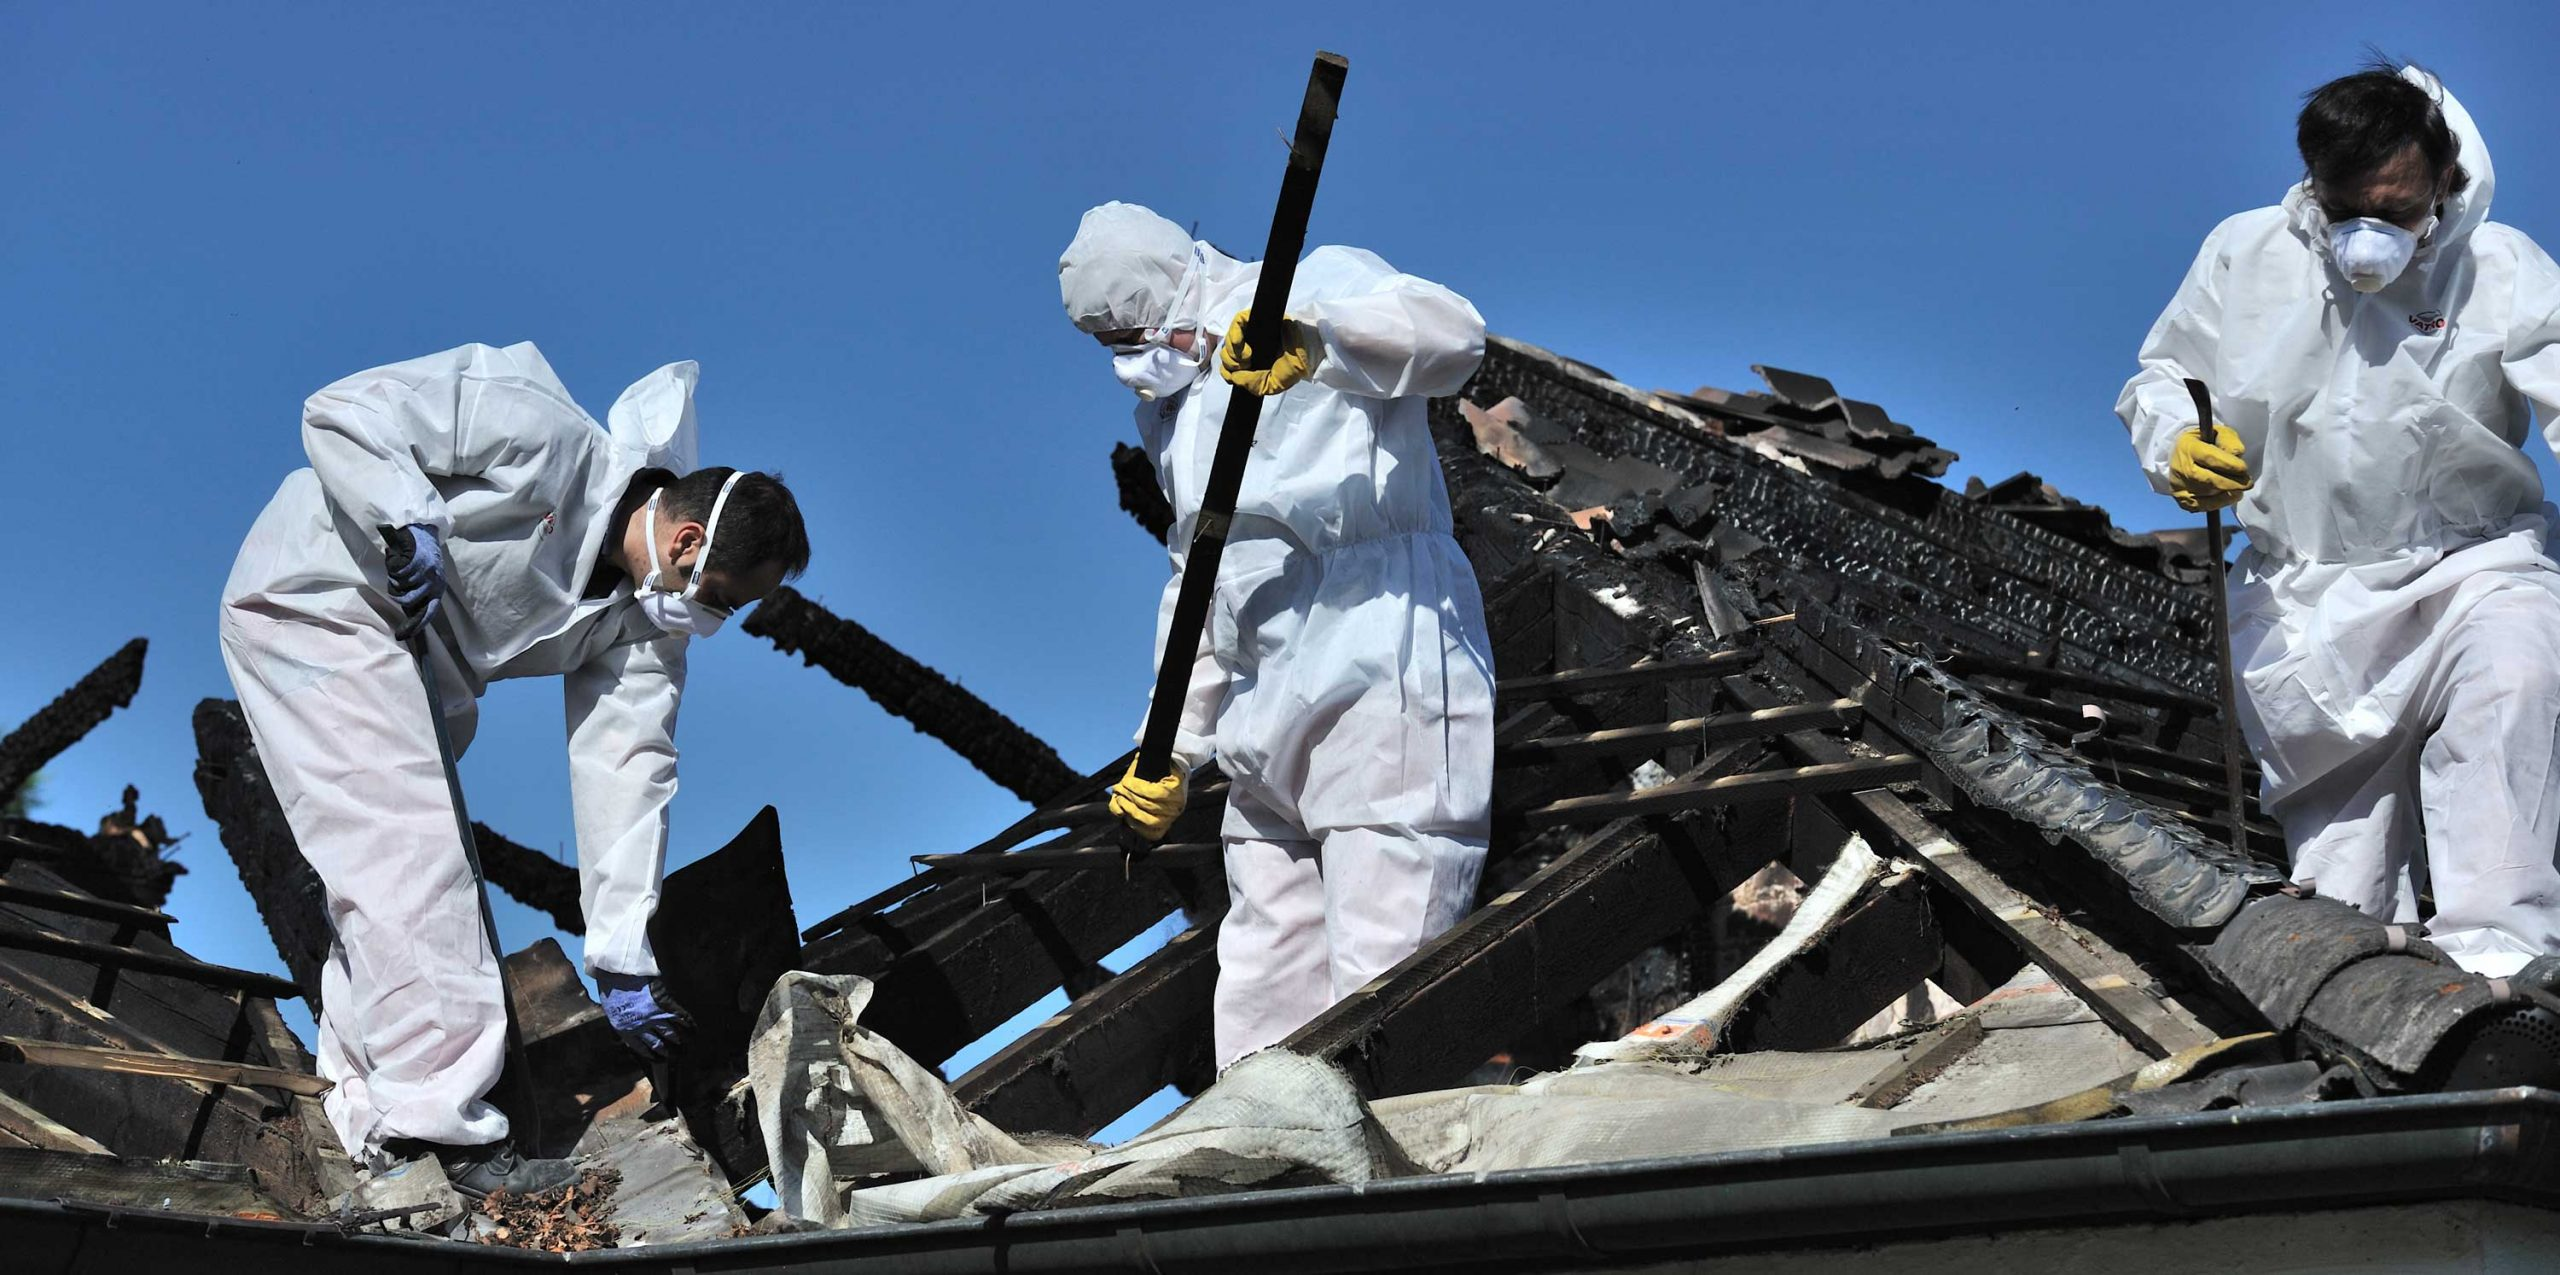 fire restoration workers